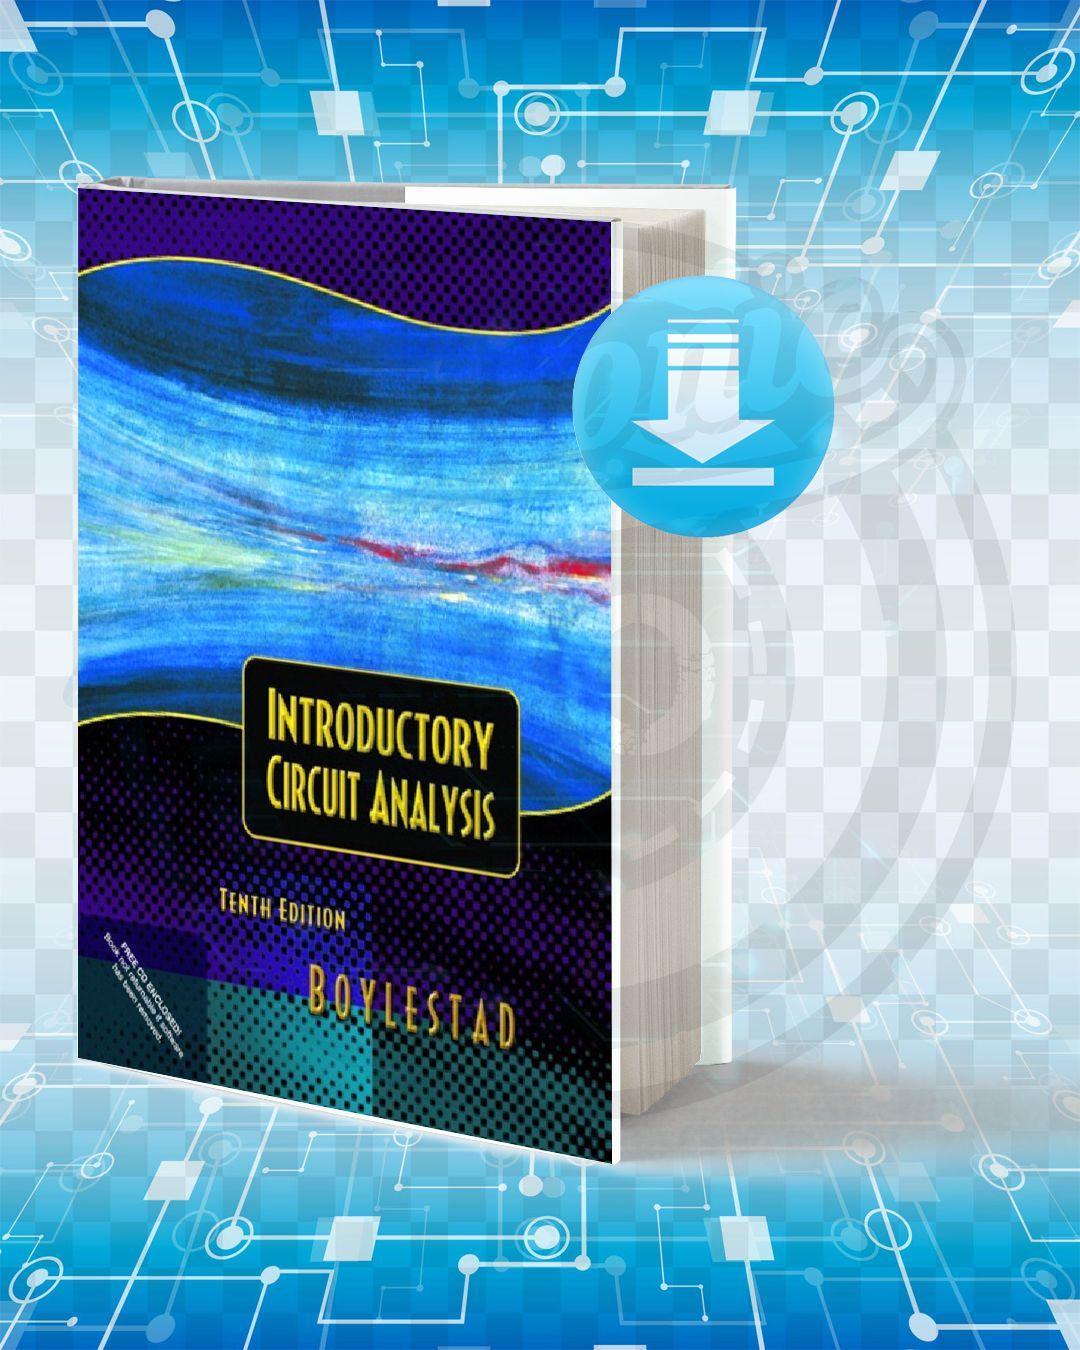 Download Introductory Circuit Analysis Pdf Electrical Engineering Books Circuit Analysis